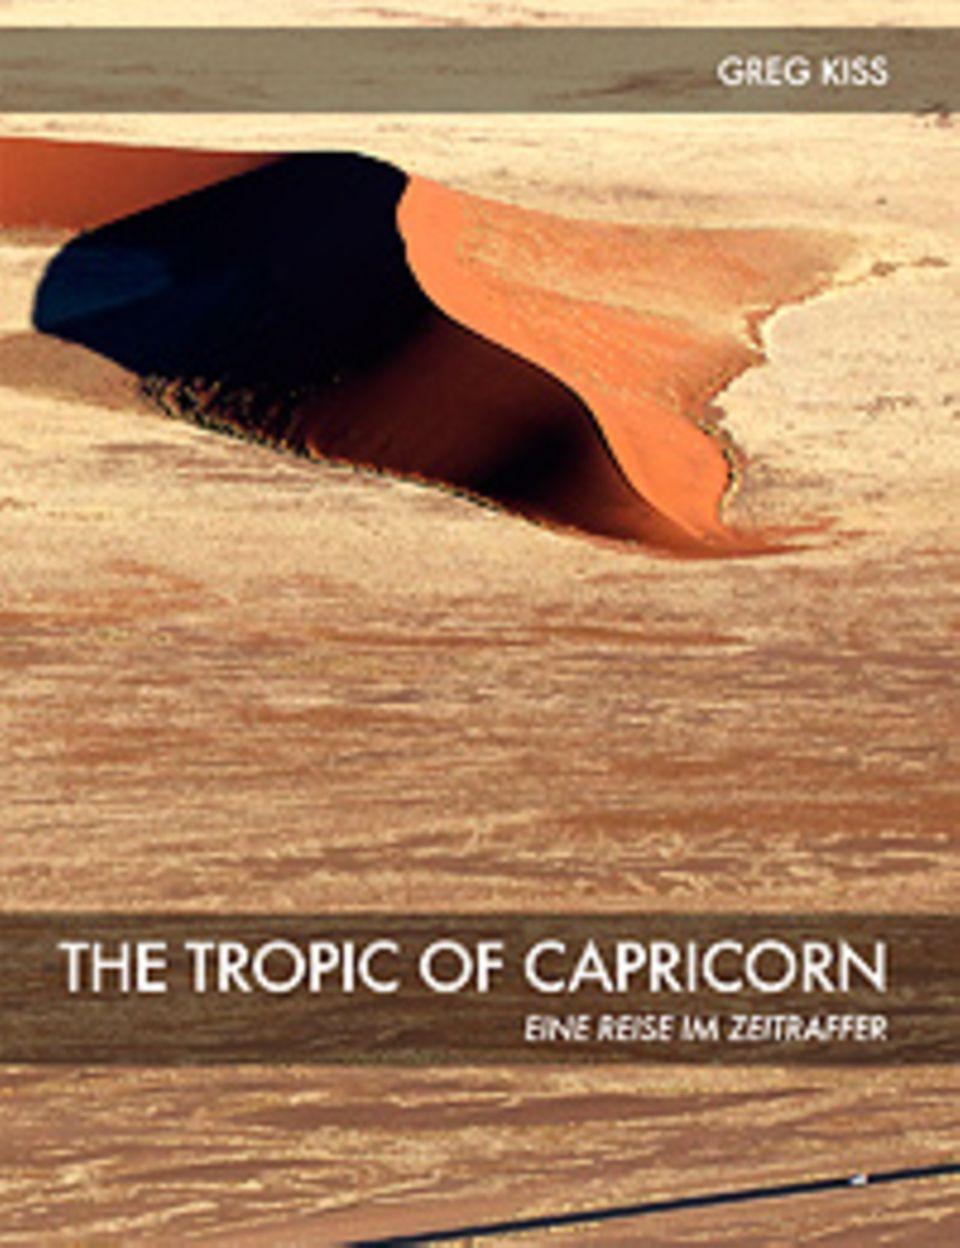 Fotogalerie: Greg Kiss The Tropic of Capricorn iBook (deutsch), 111 Seiten 124 Fotos, 2012, 8,90 Euro